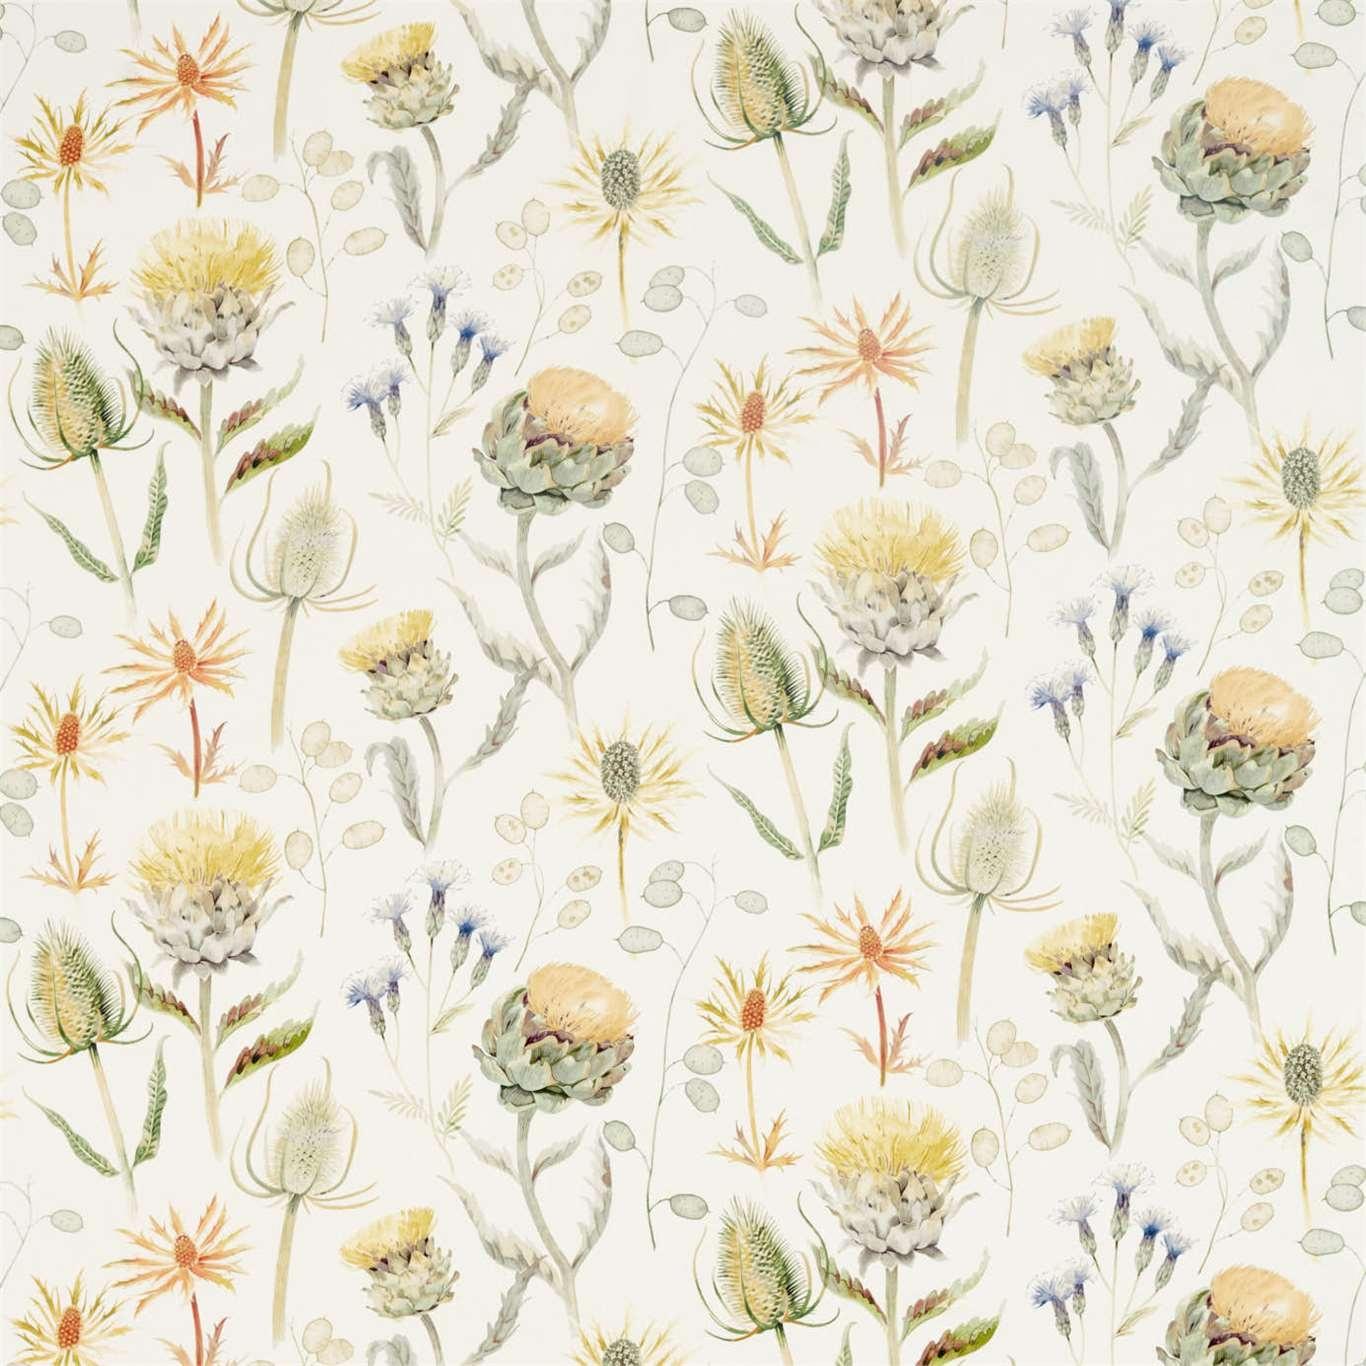 Image of Sanderson Thistle Garden Ochre/Olive Curtain Fabric 226422